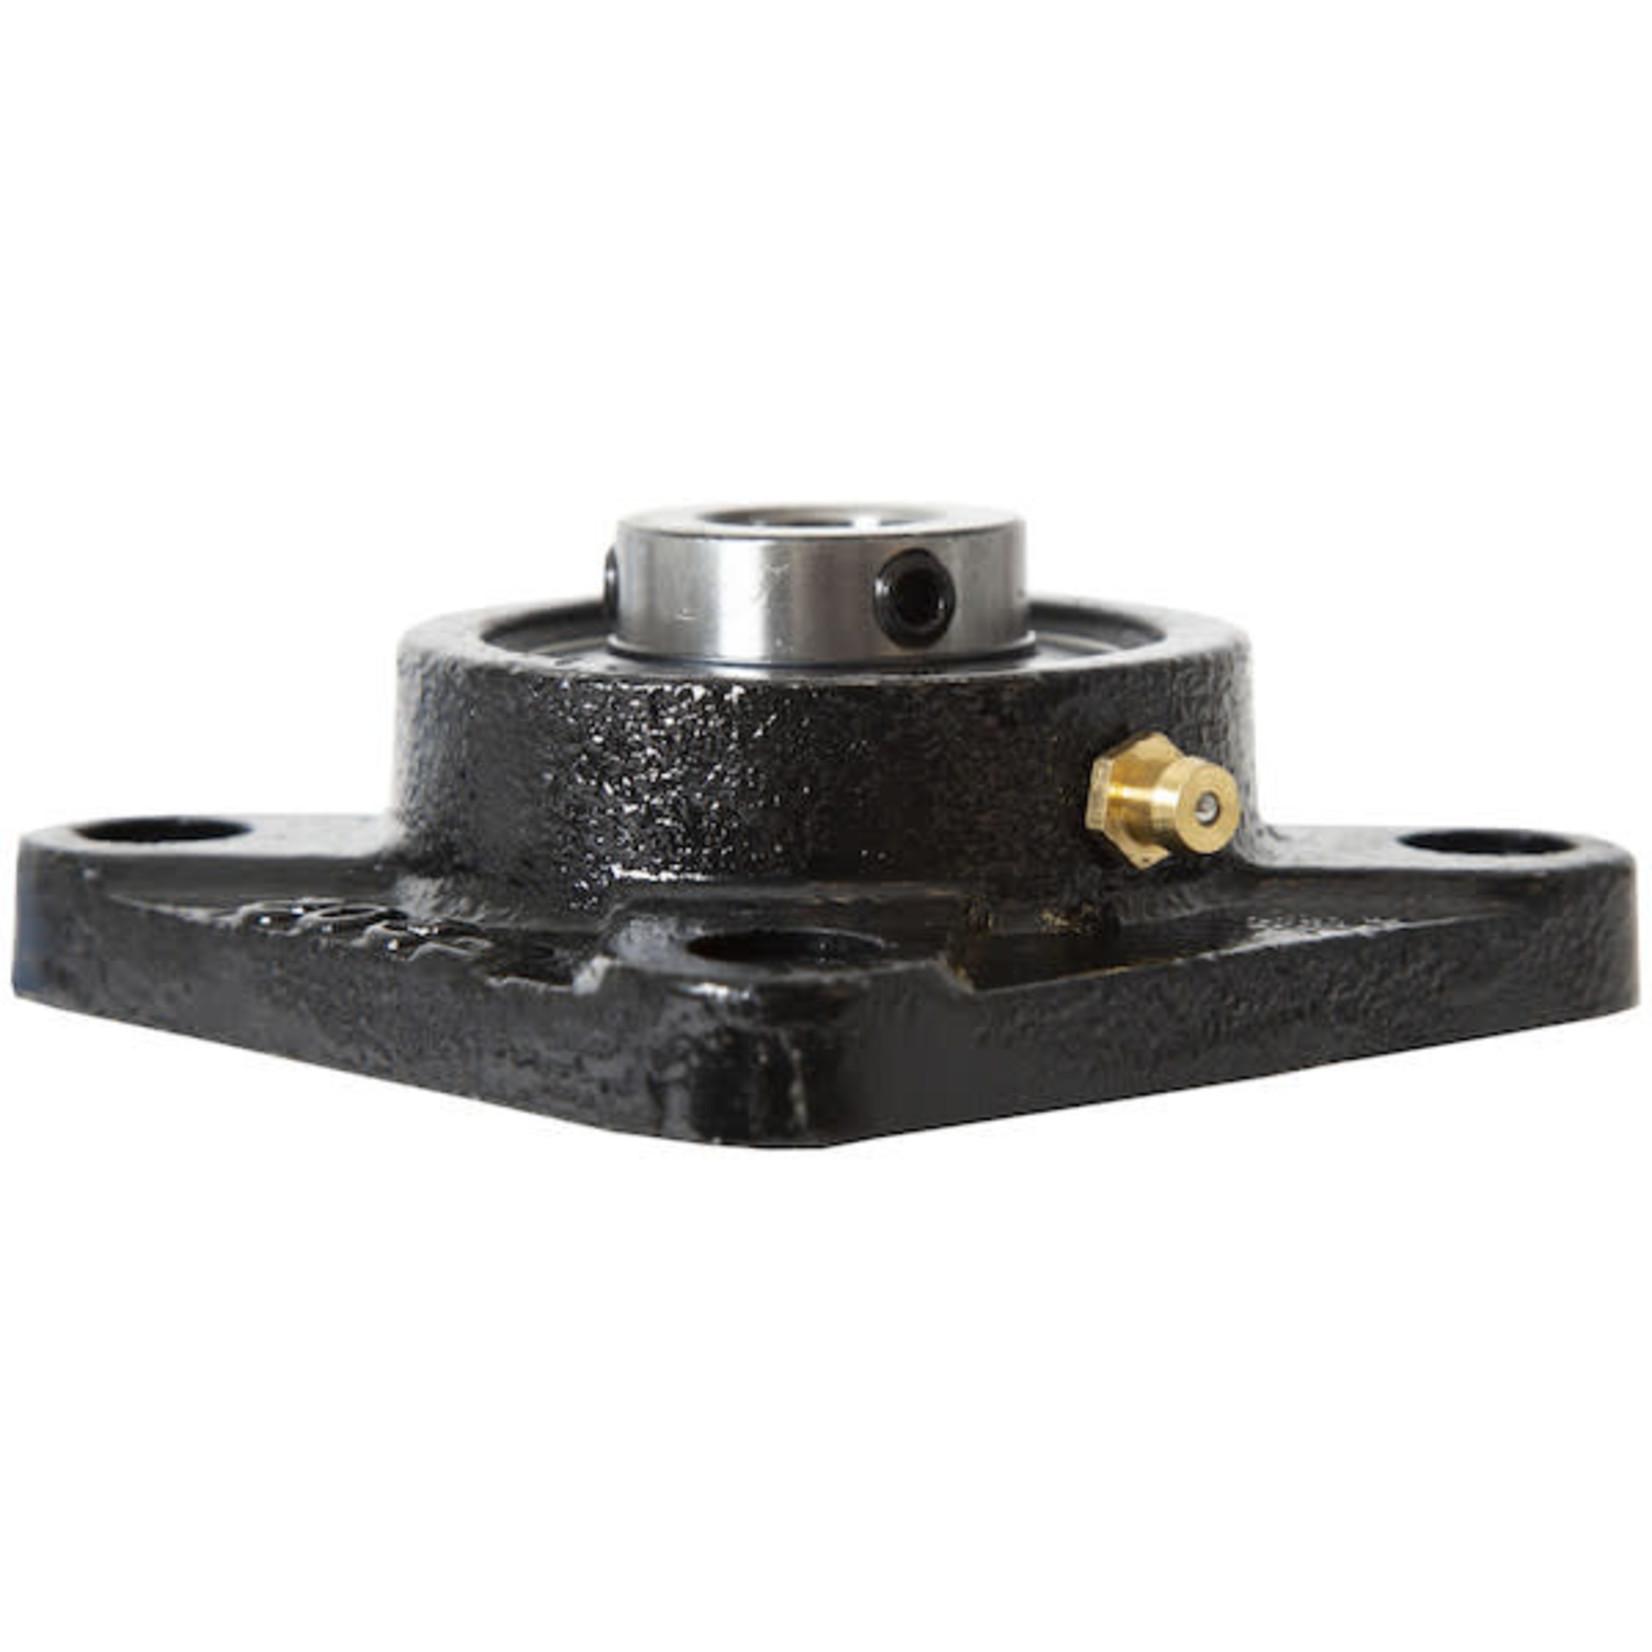 SaltDogg Replacement 4-Hole 5/8 Inch Bearing